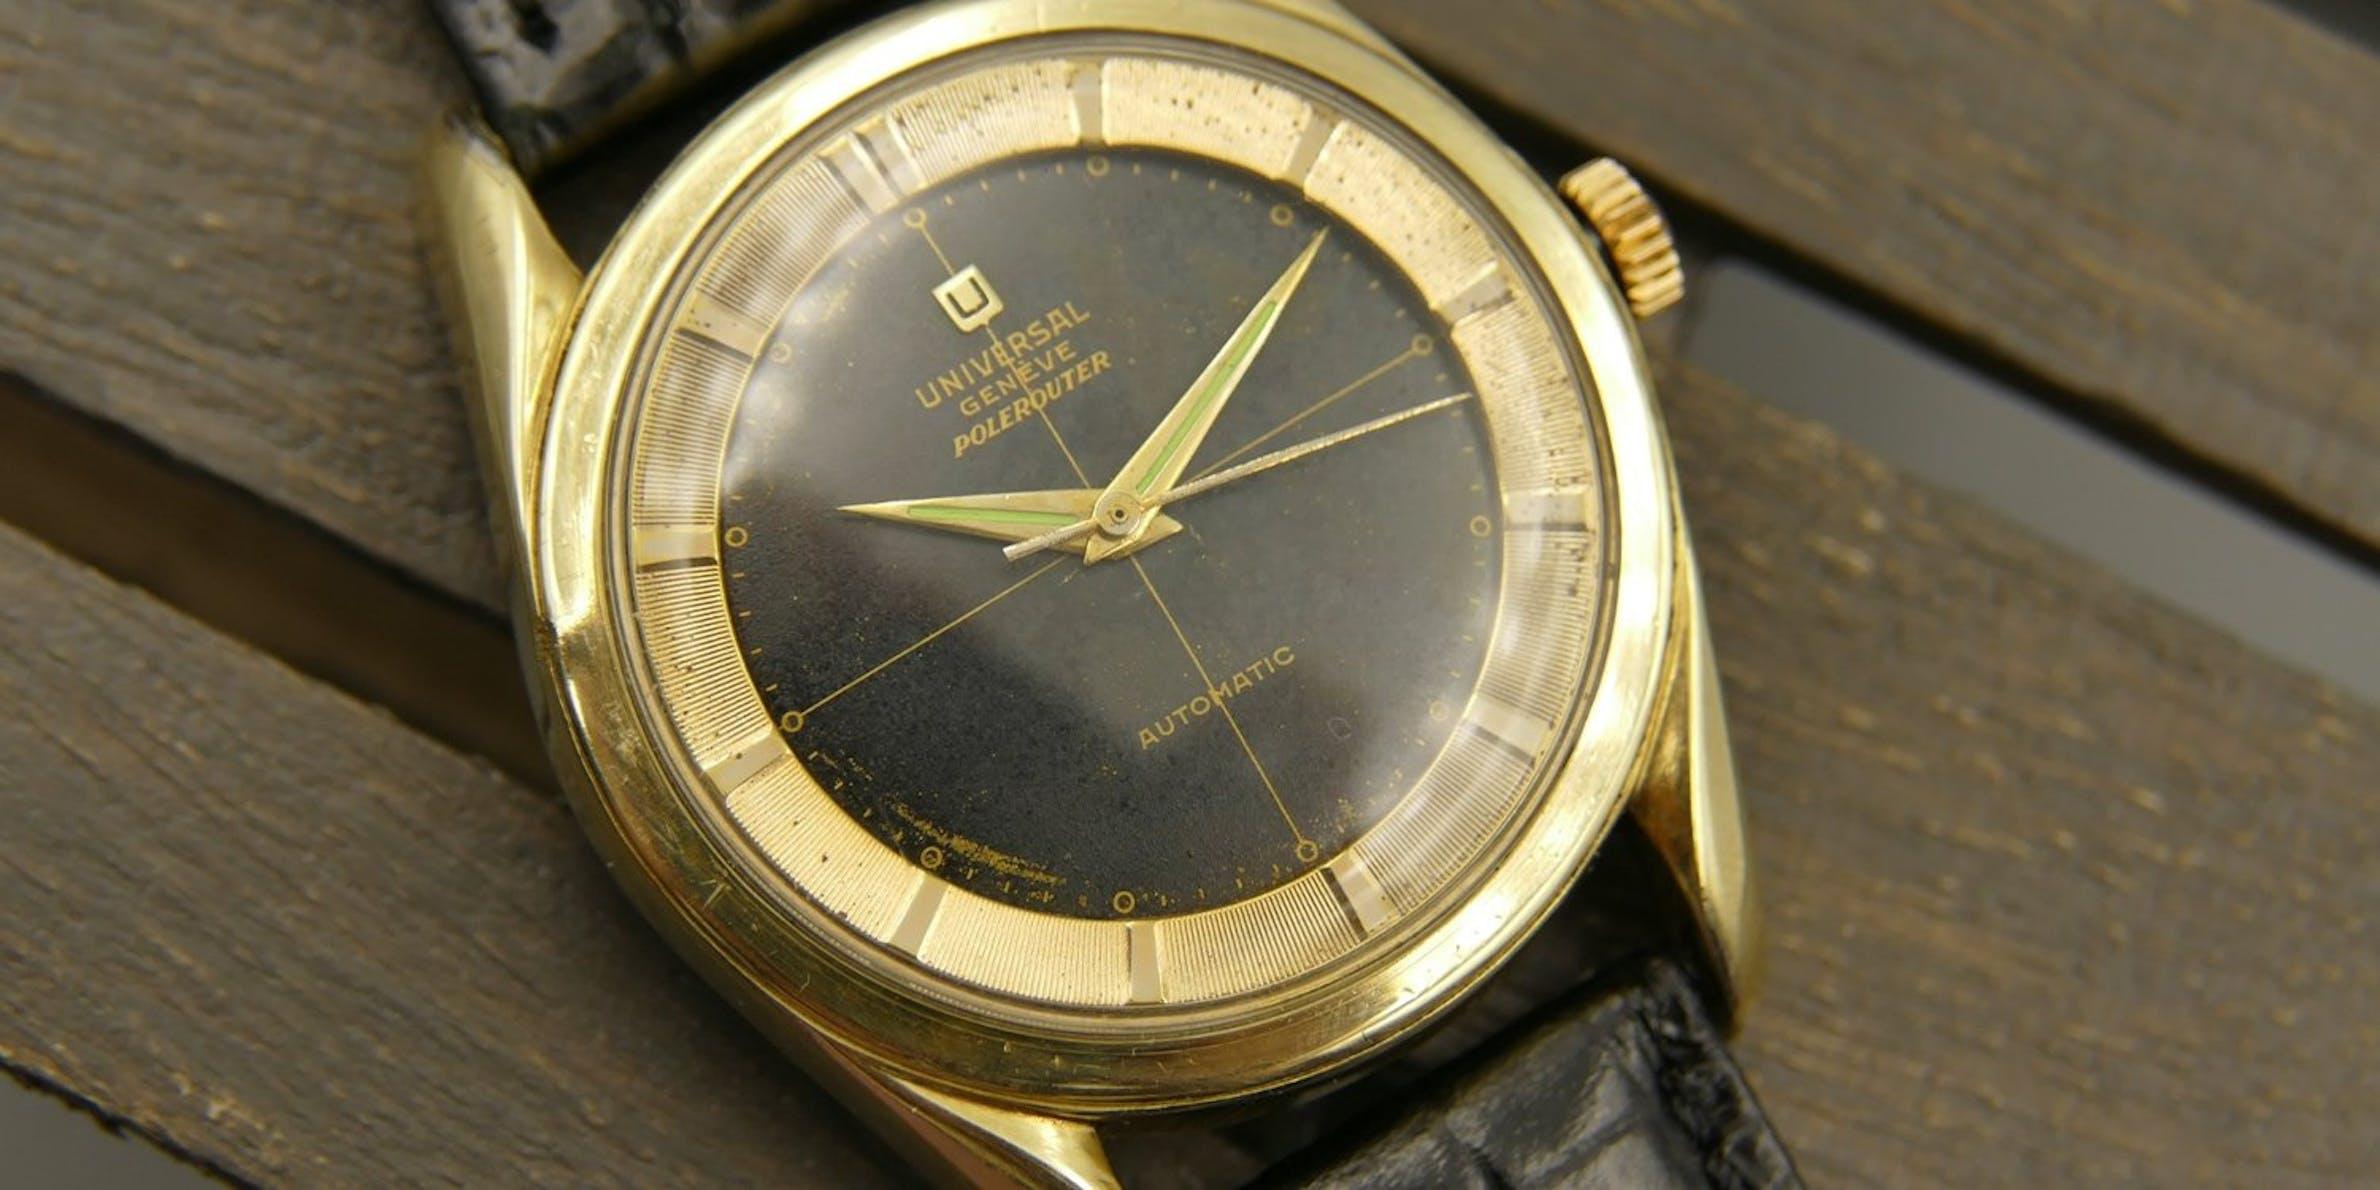 Besondere Vintage-Uhren: Universal Genève Polerouter